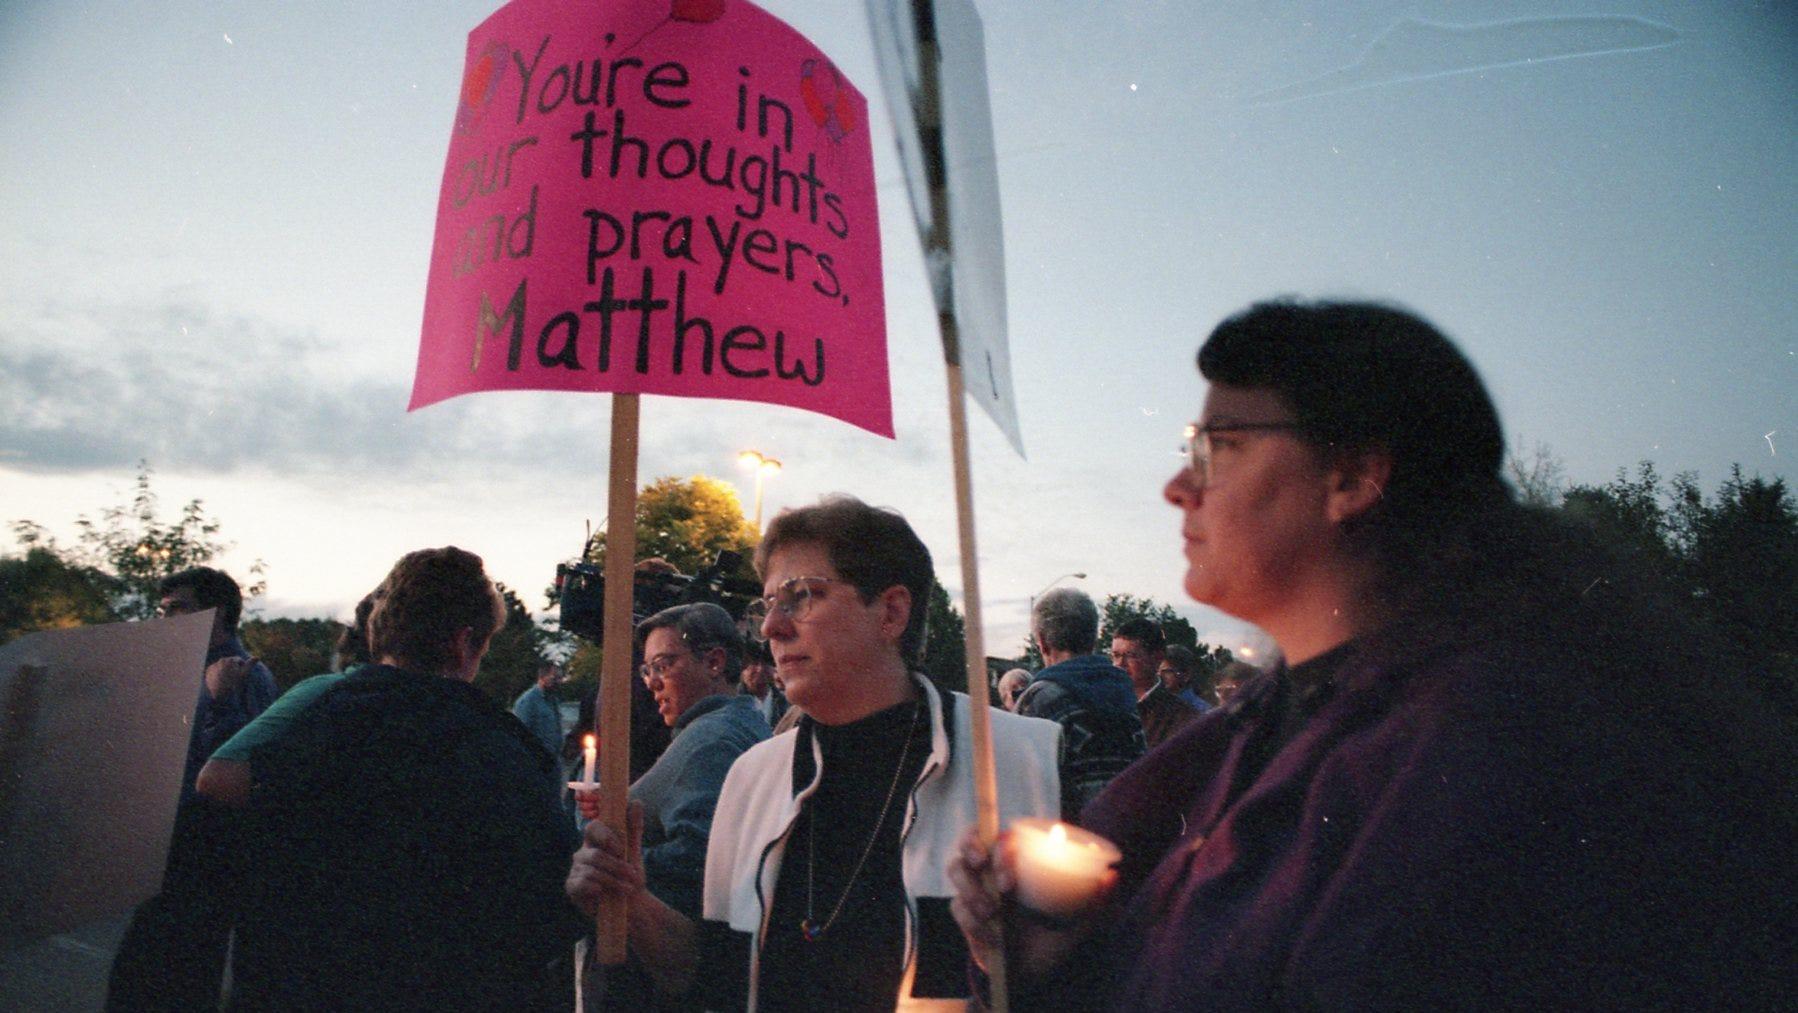 Podcast: The murder of Matthew Shepard